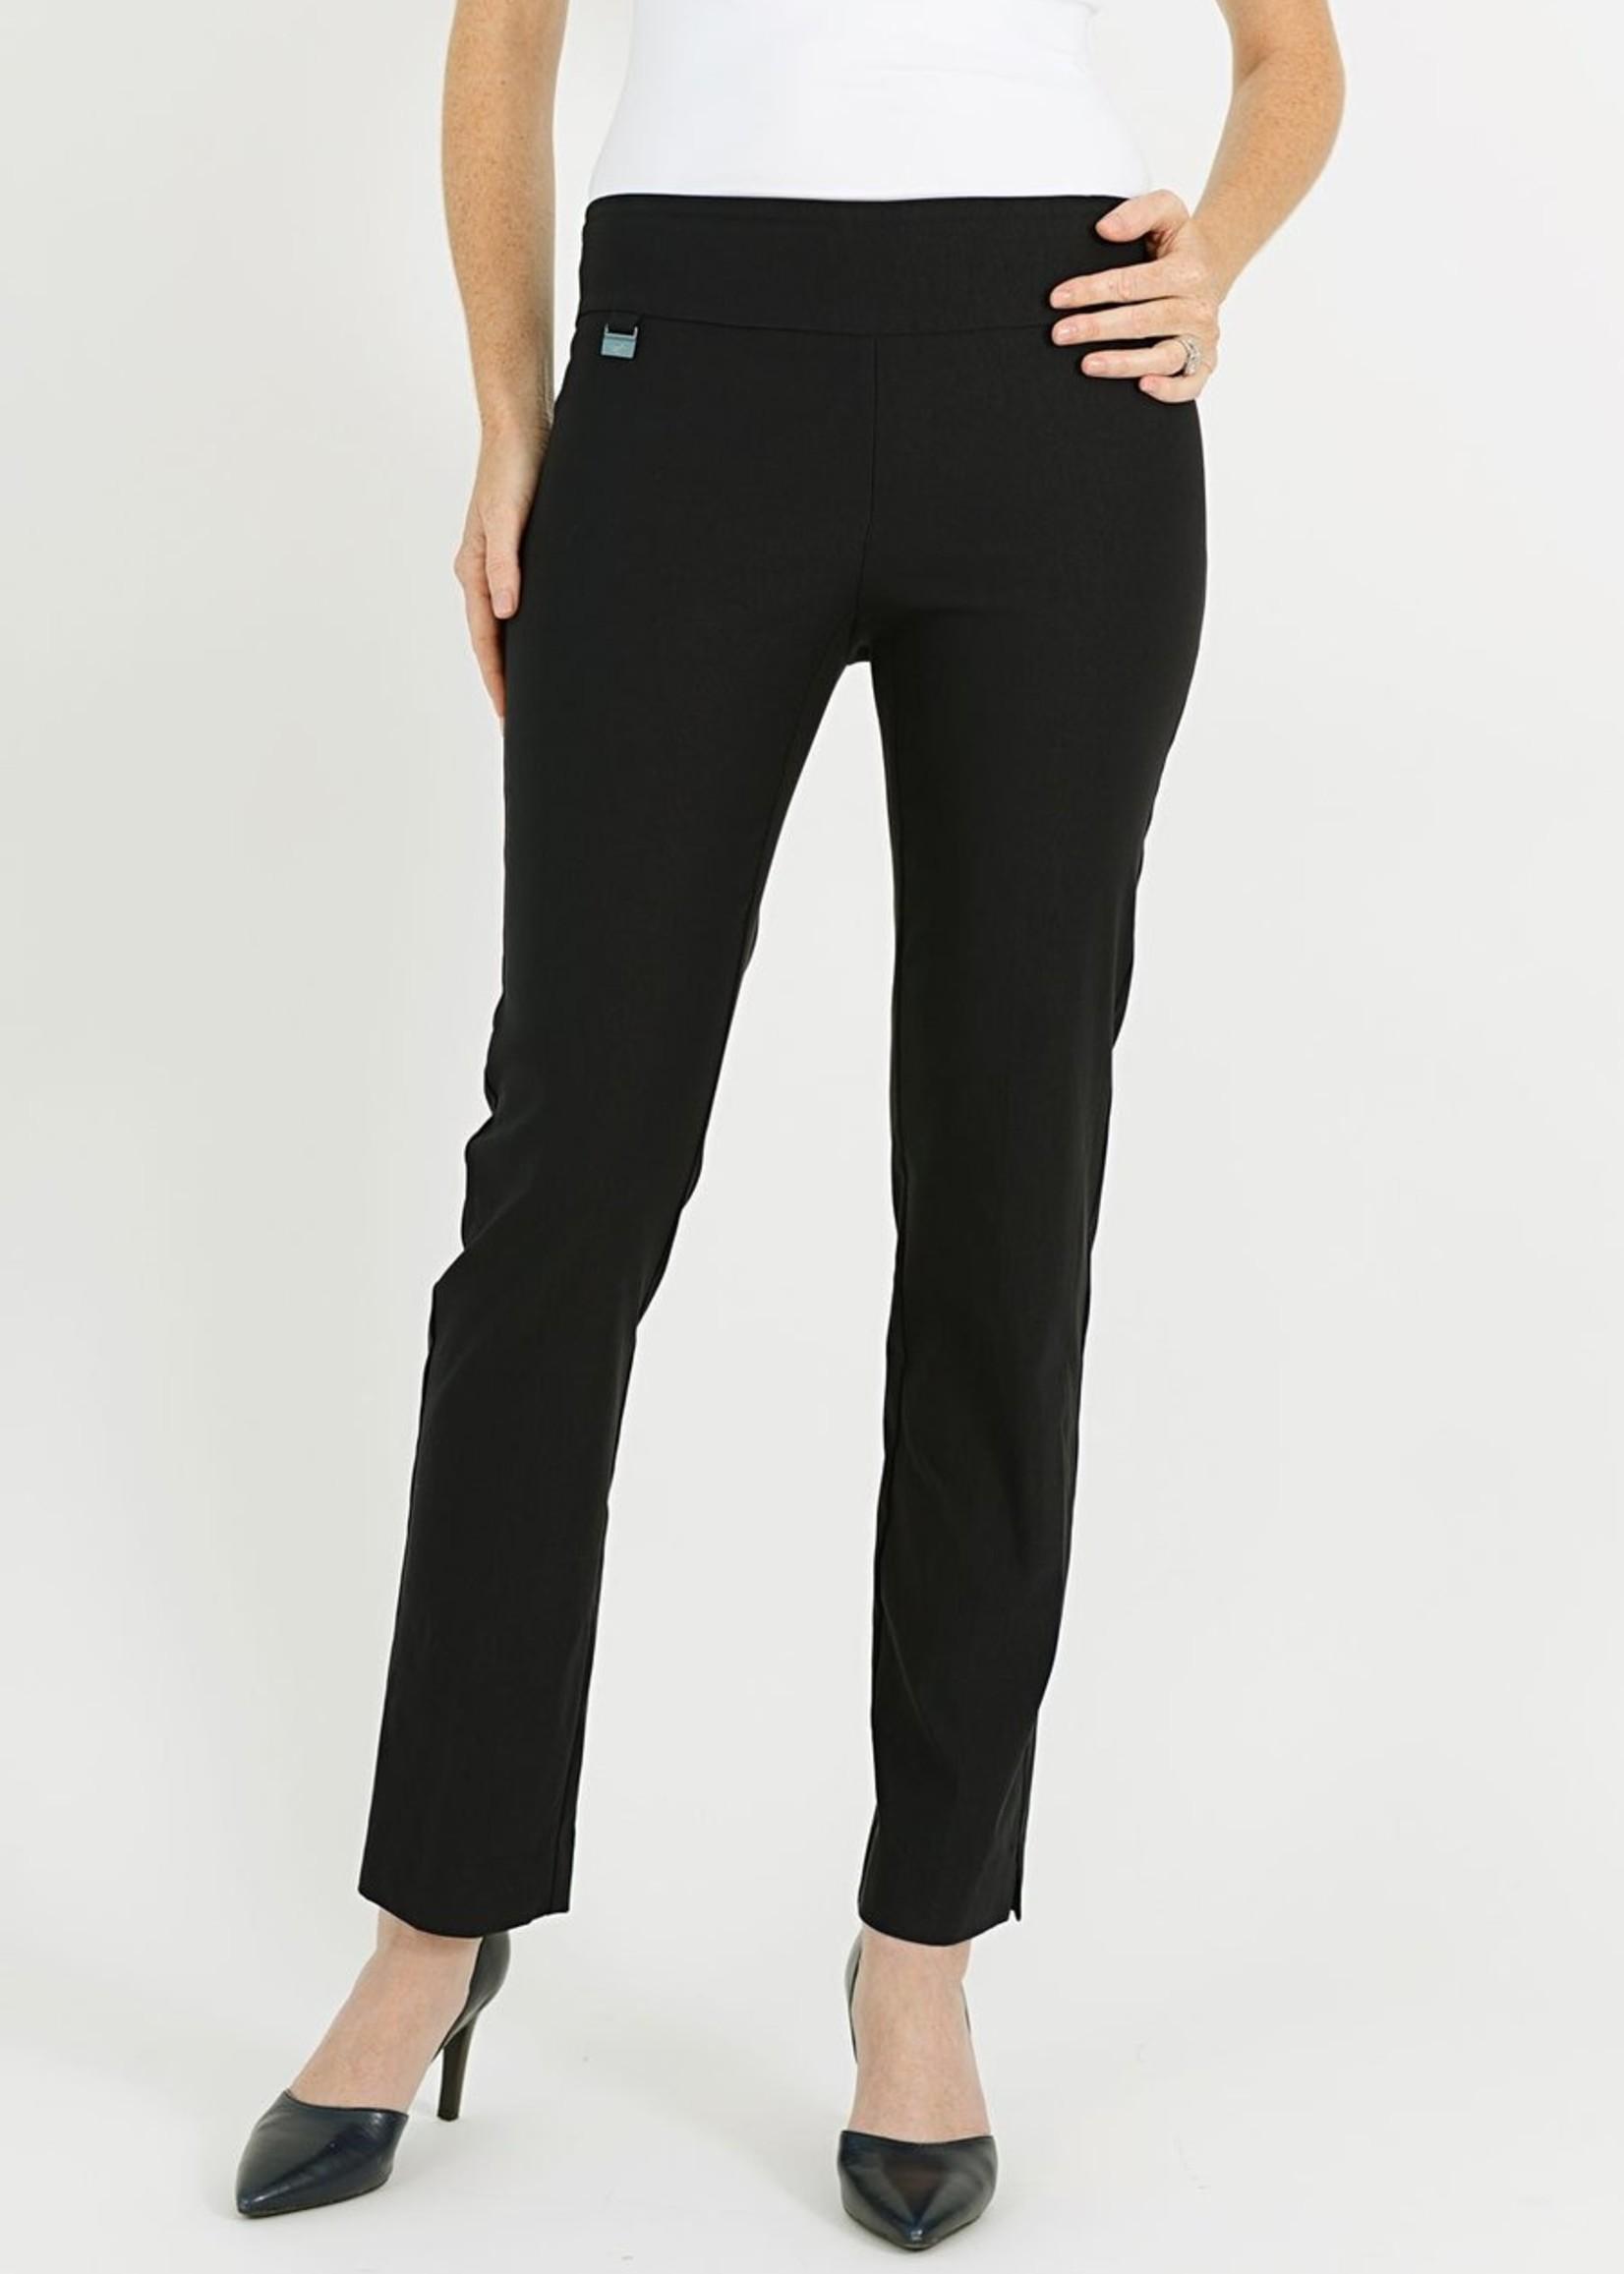 Lisette L Lisette L Pullon Black Pant